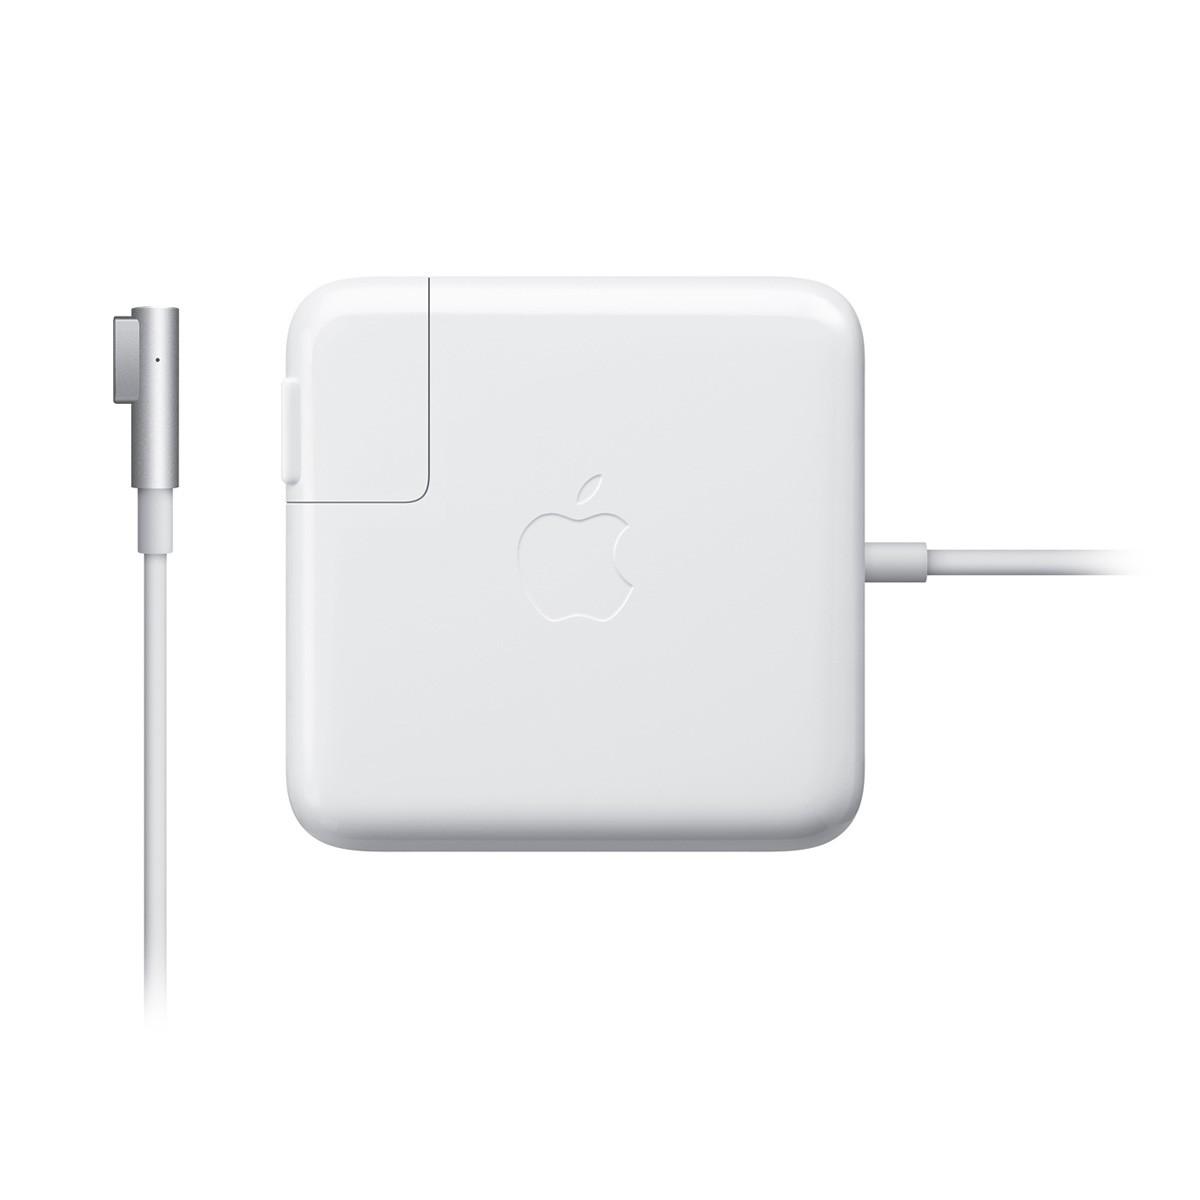 "60W napájecí adaptér Apple MagSafe (pro MacBook a 13"" MacBook Pro) mc461z/a"